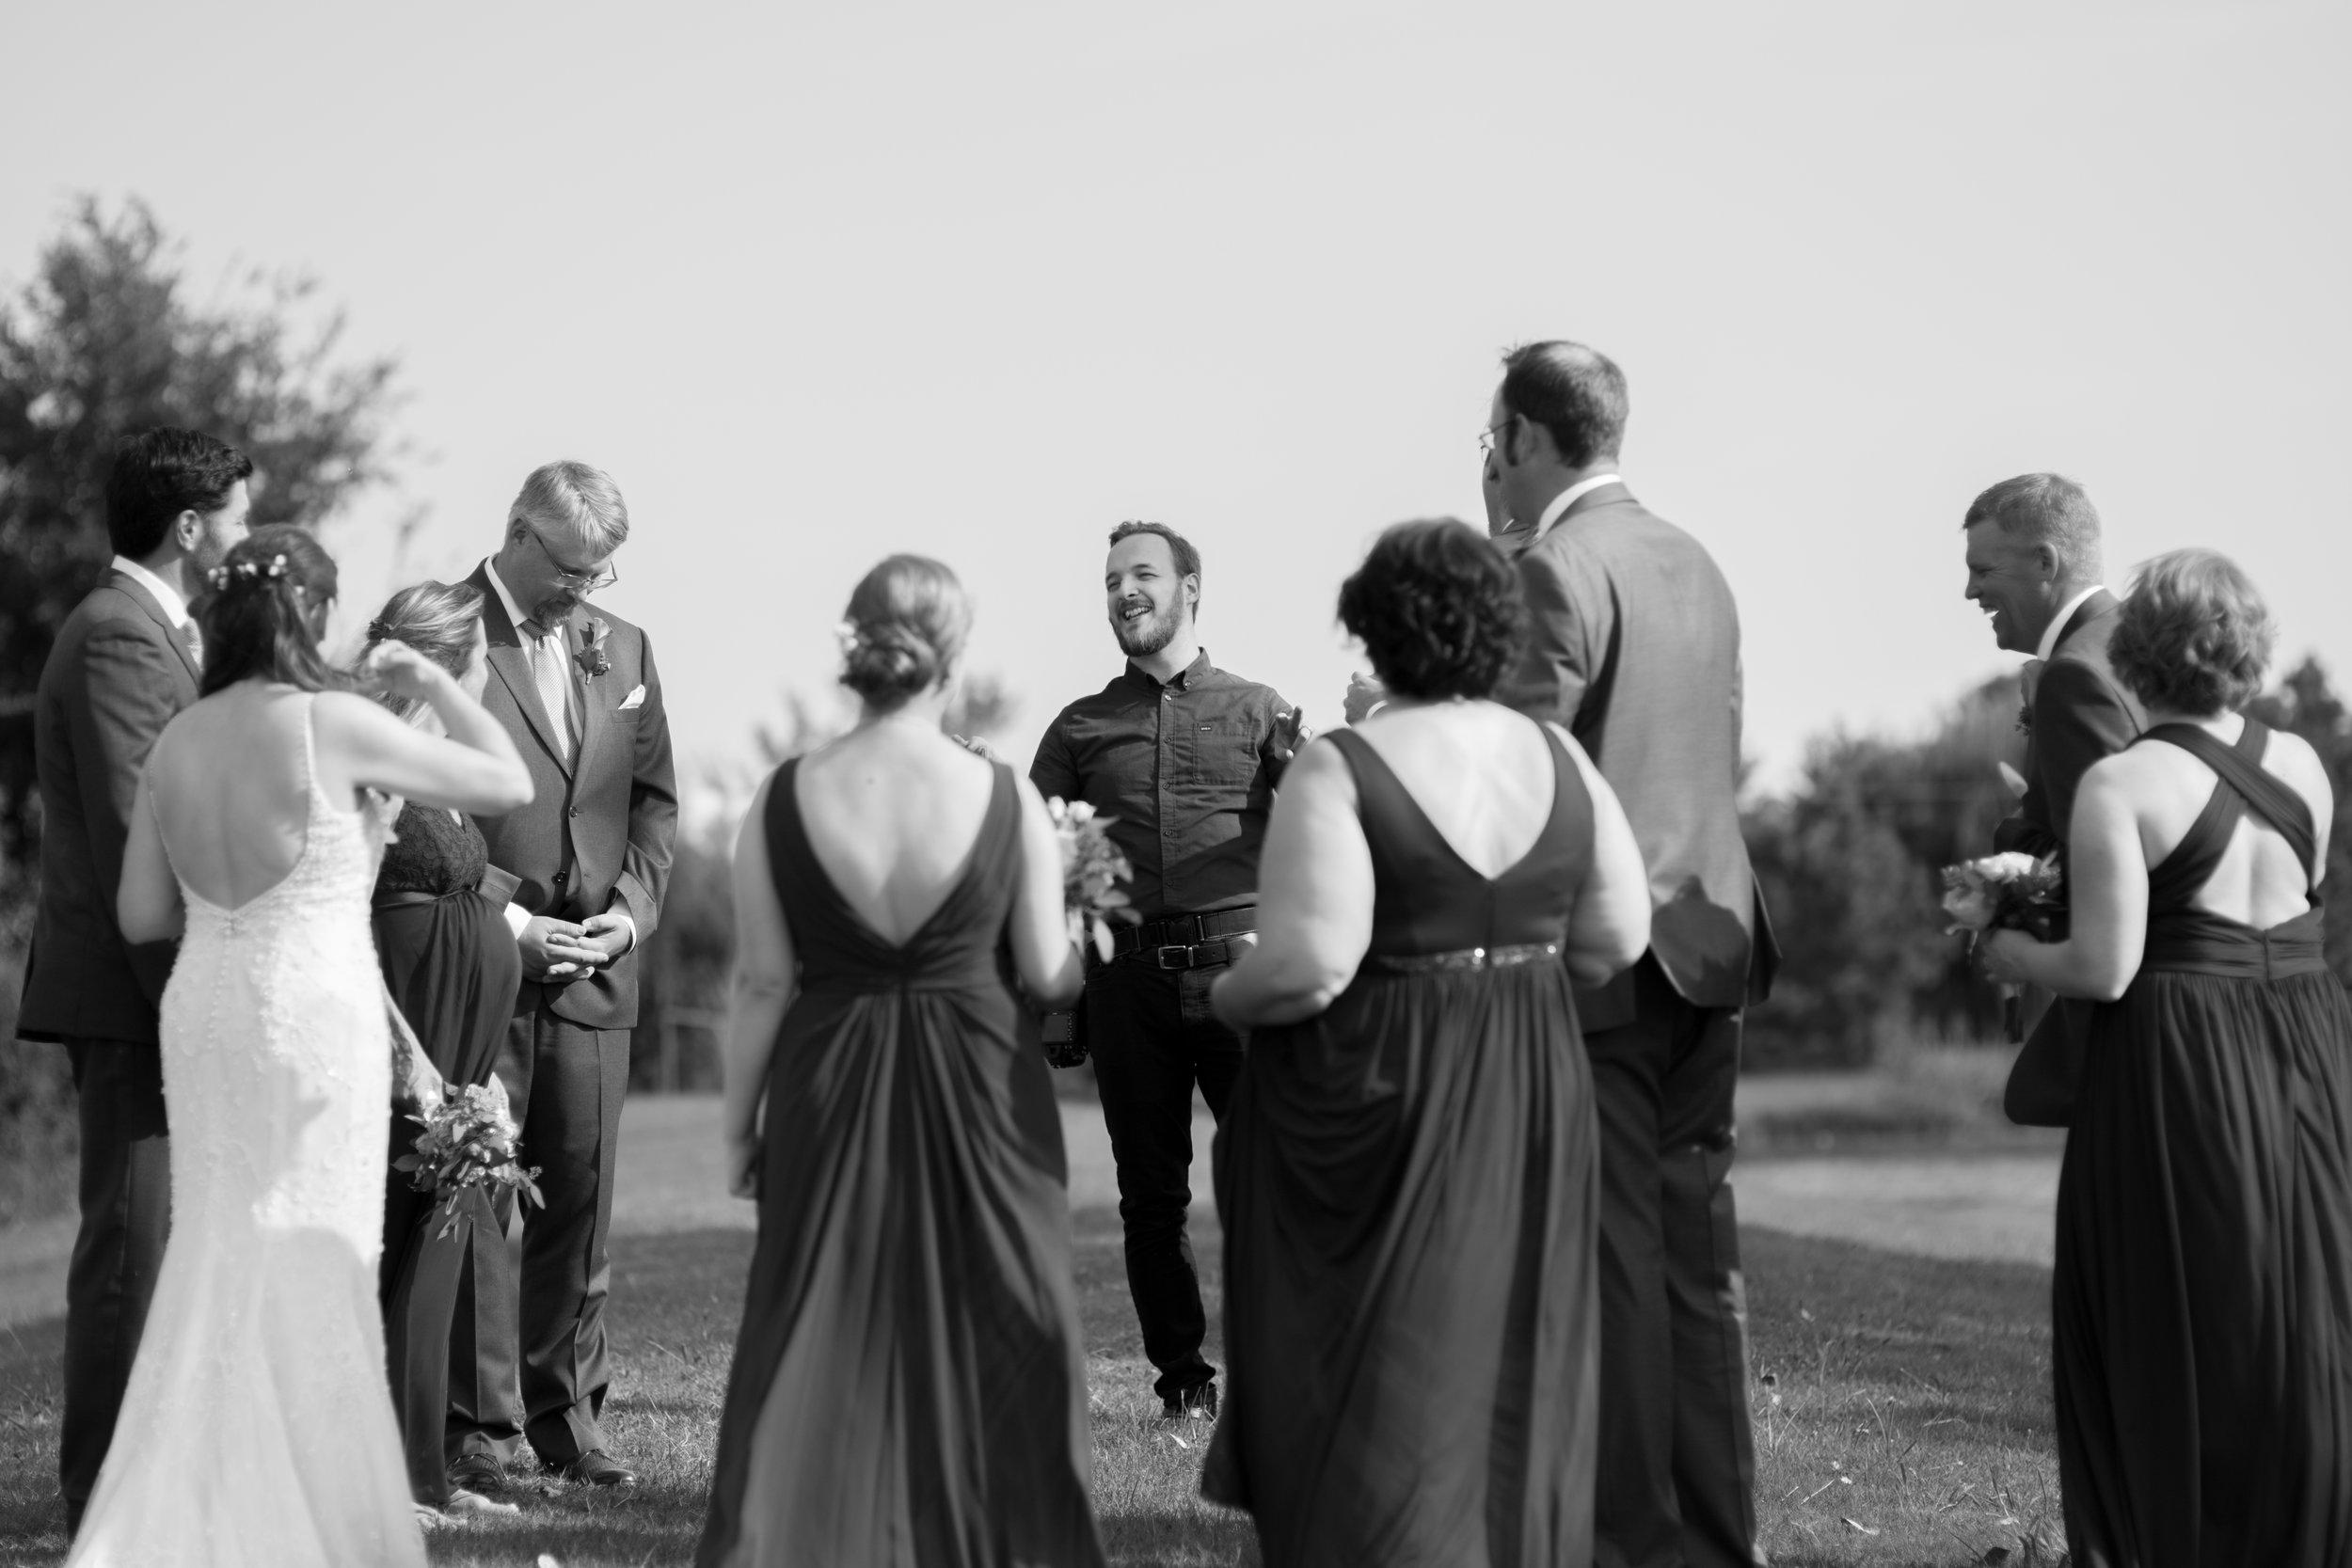 2017 Pearce Wedding05.jpg